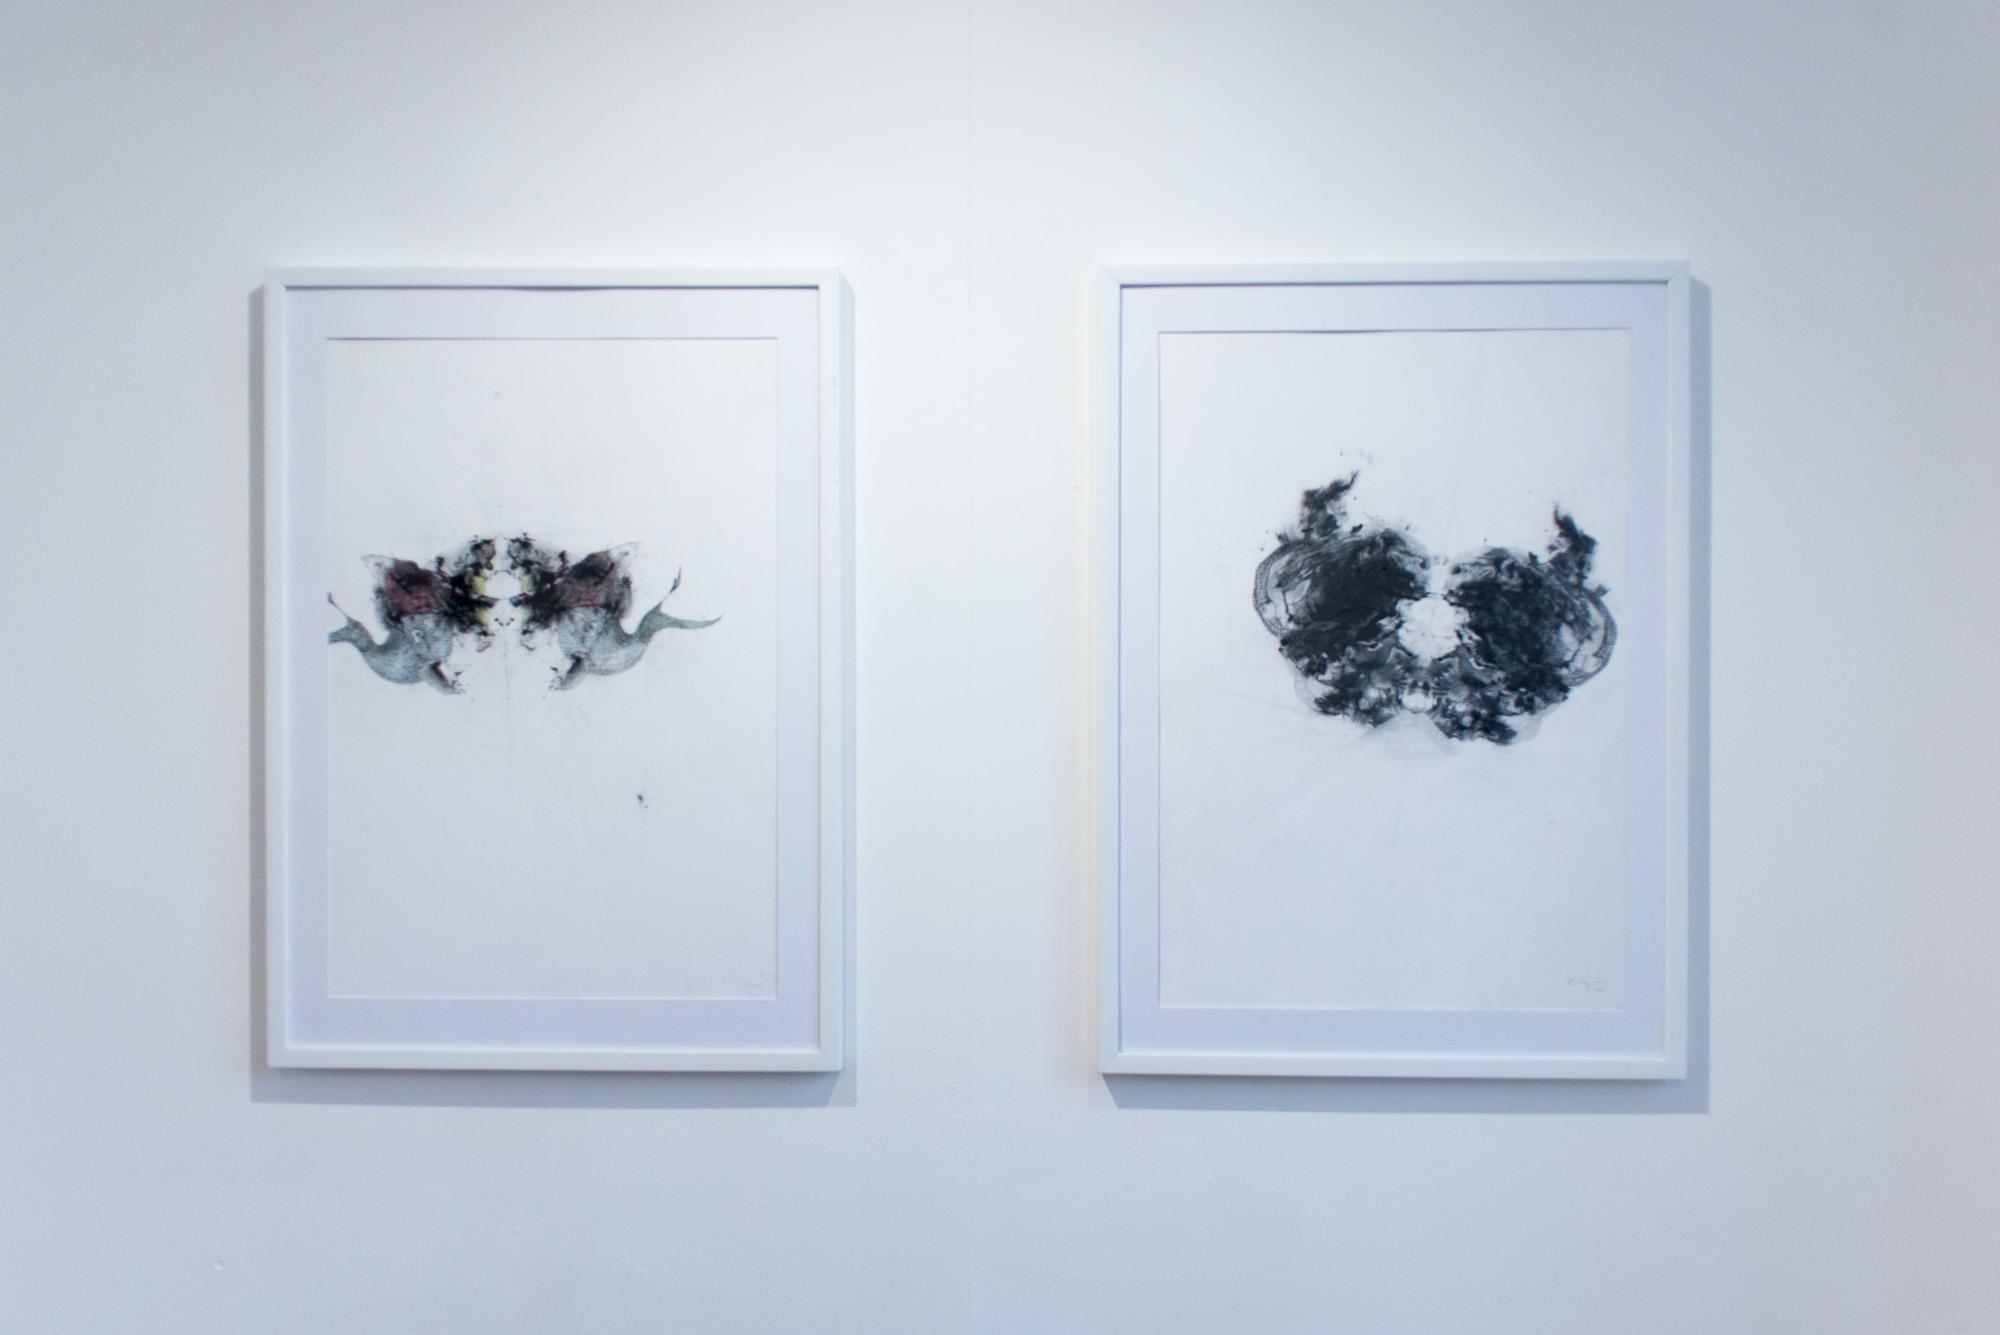 Ebor Exhibition: Karen Lyons